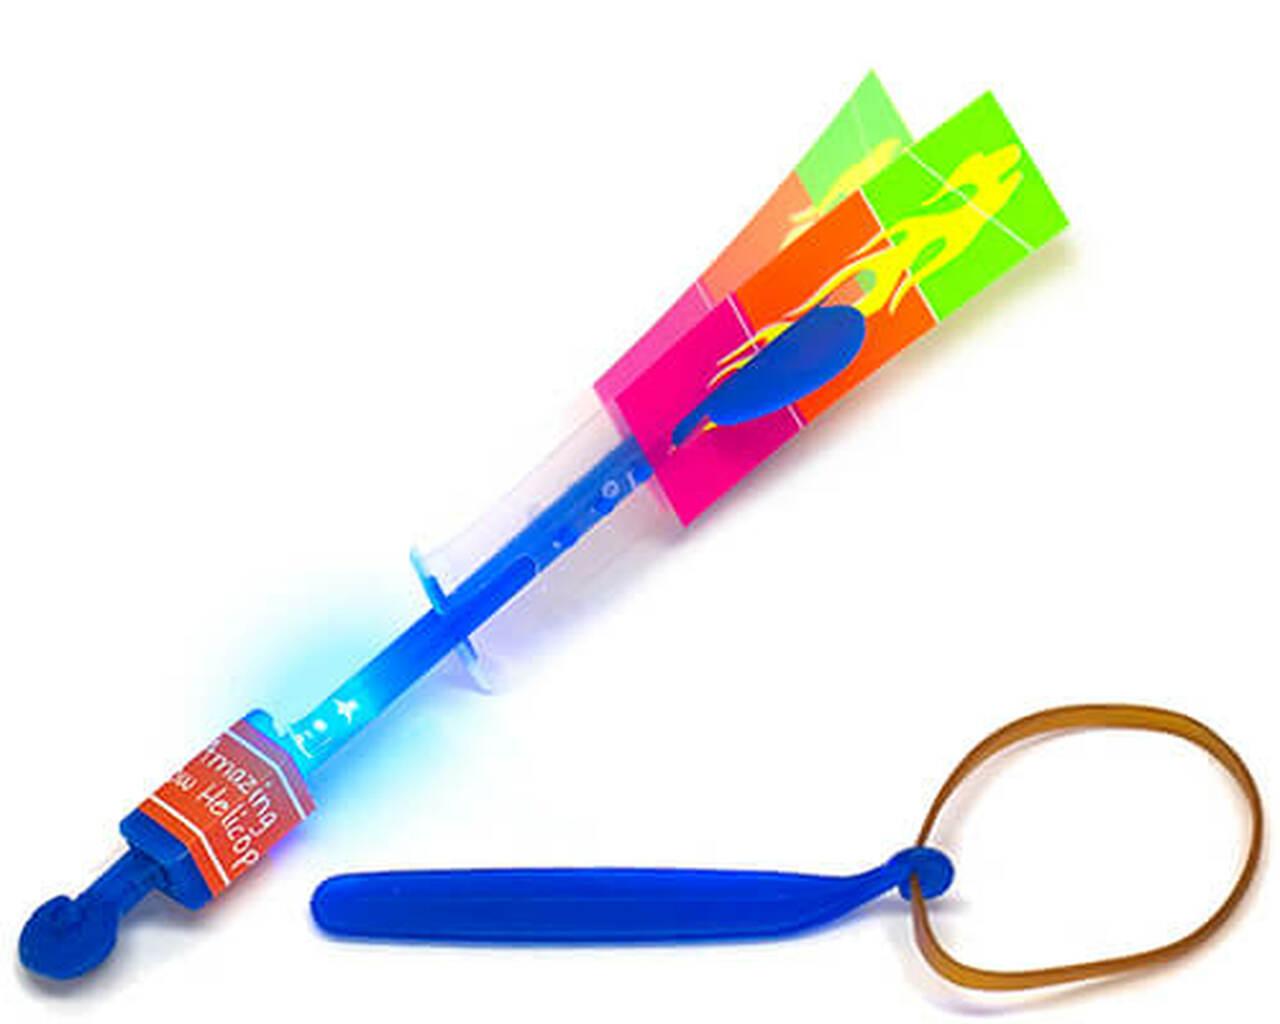 Perpetual kid toys